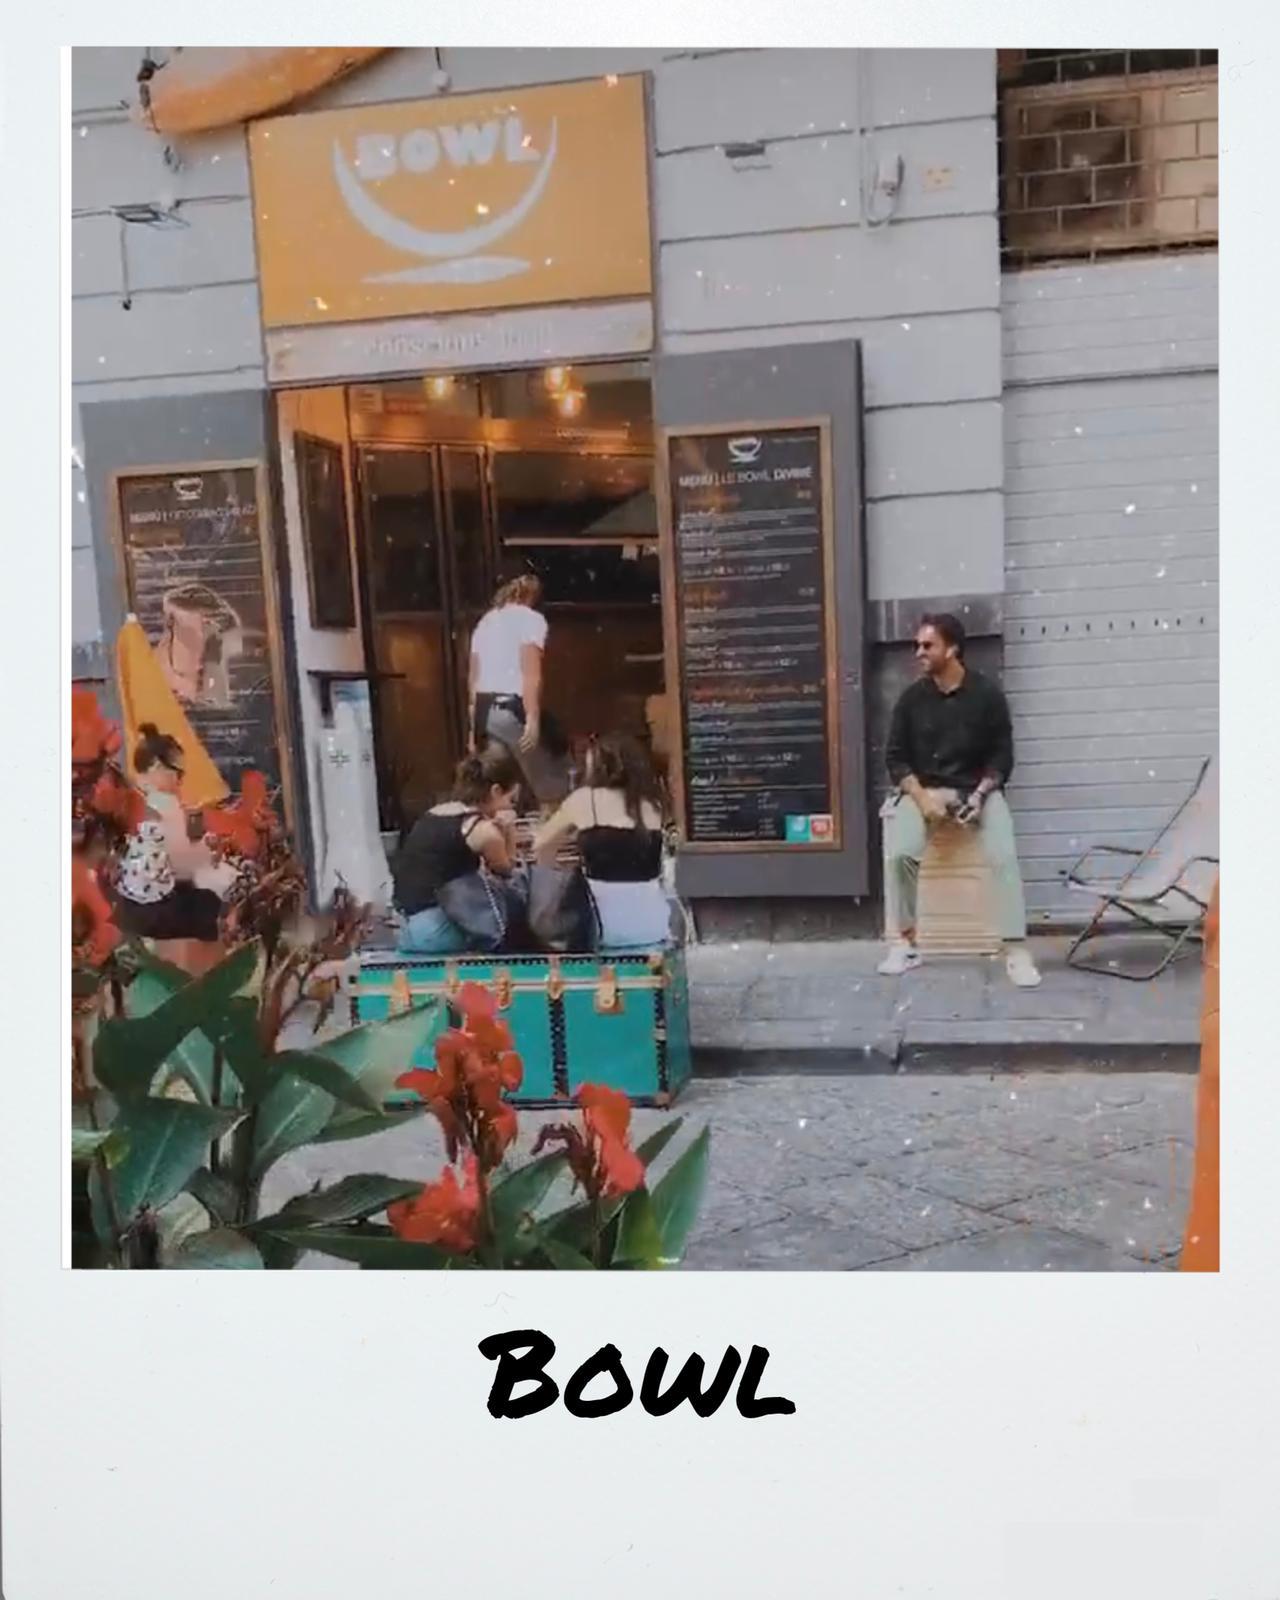 Bowl Napoli via Salvatore de Renzi